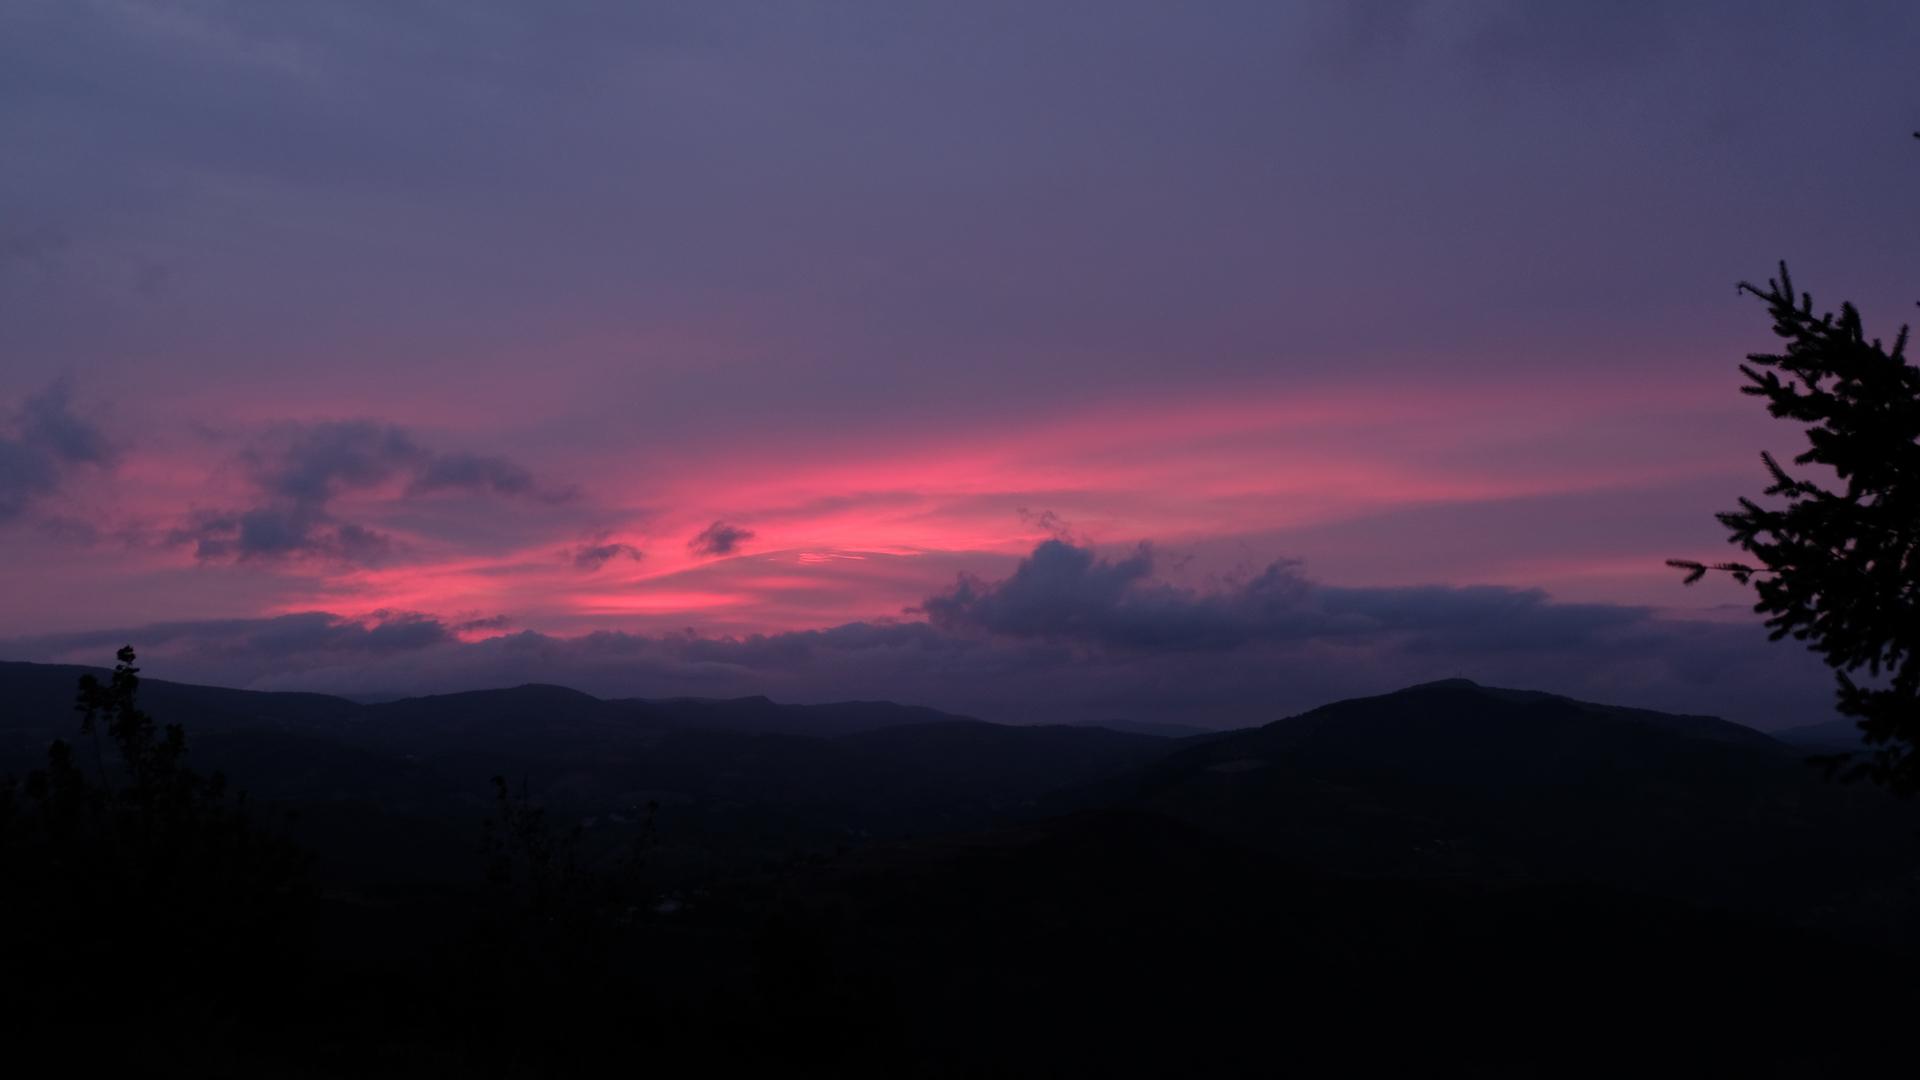 Sunset 1920x1080